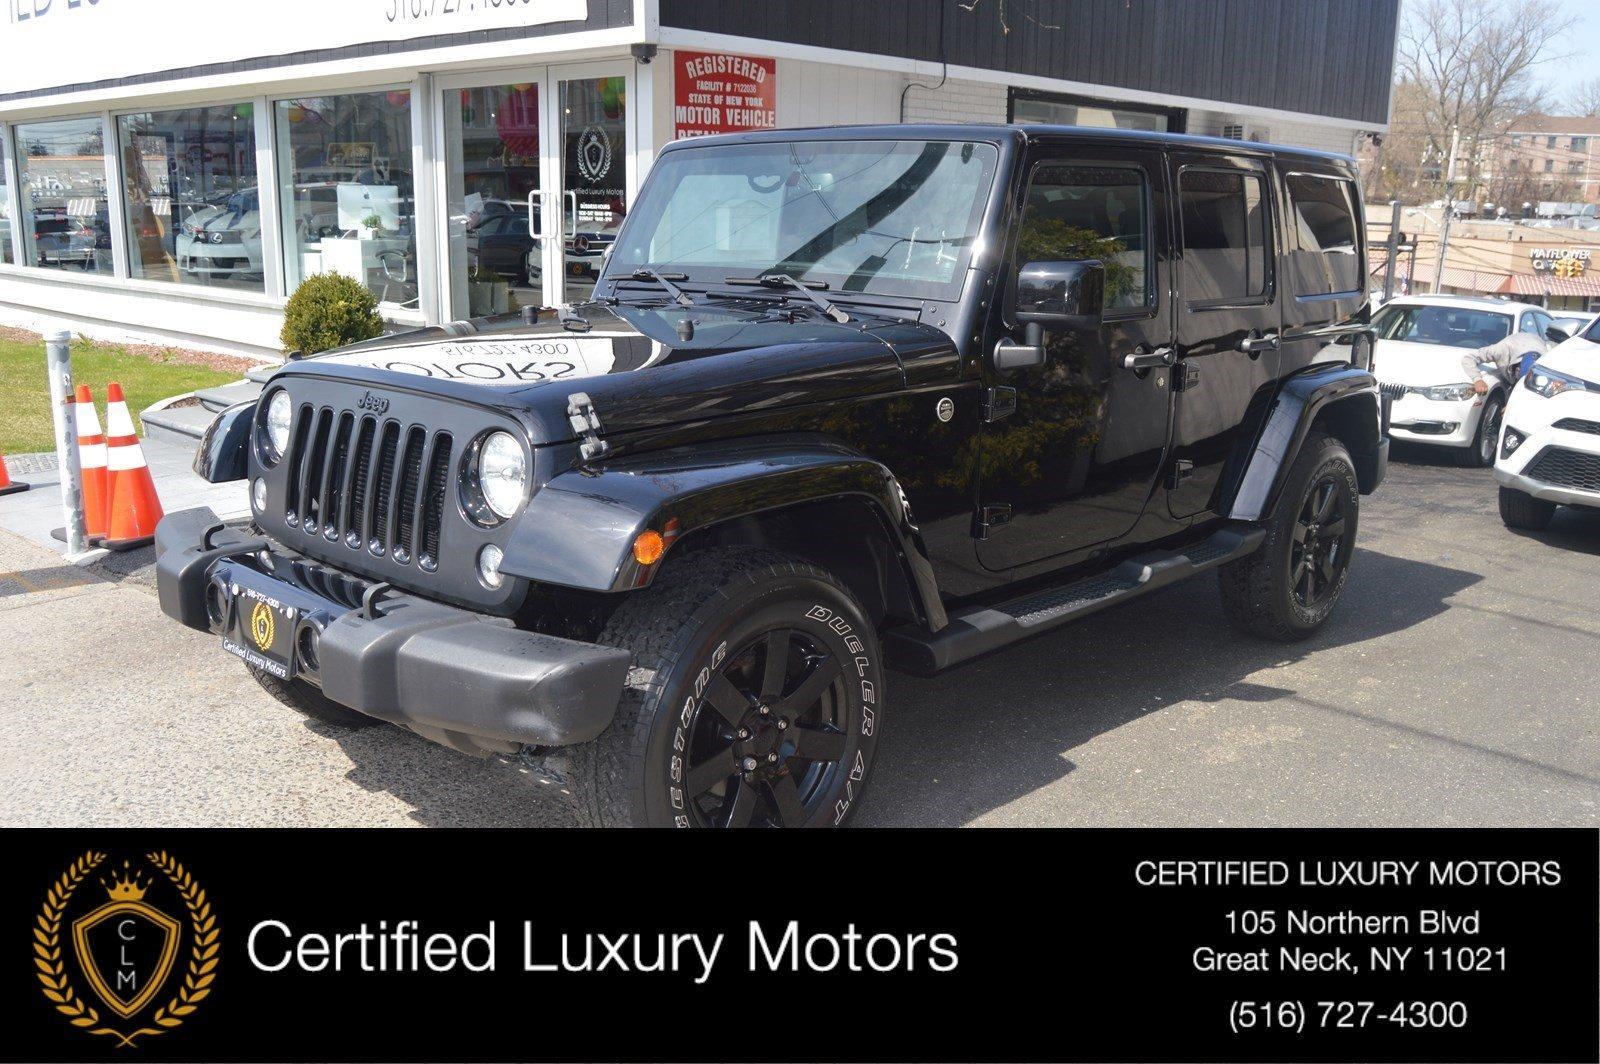 Used 2014 Jeep Wrangler Unlimited Sahara (Navi, Leather) | Great Neck, NY